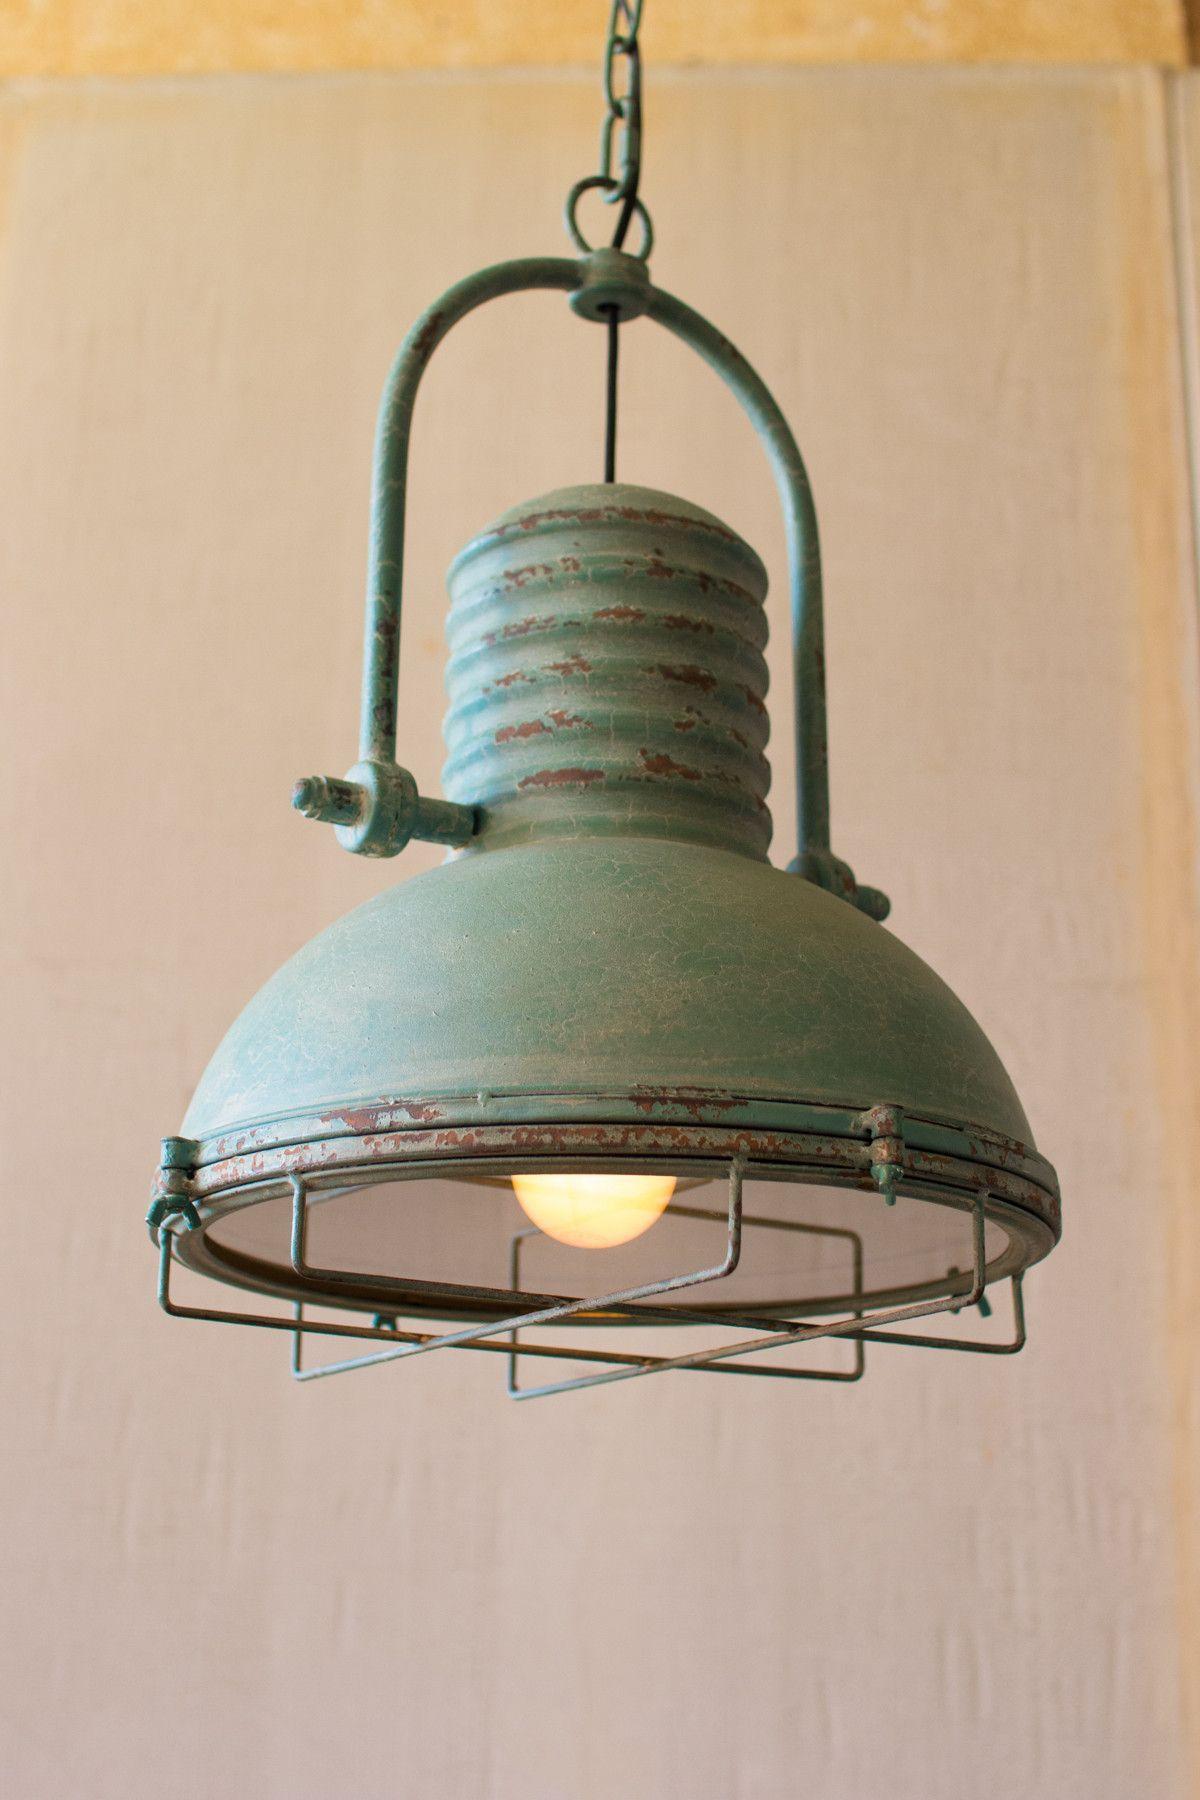 Kalalou Antique Turquoise Wire Cage Pendant Light | Purpose ...